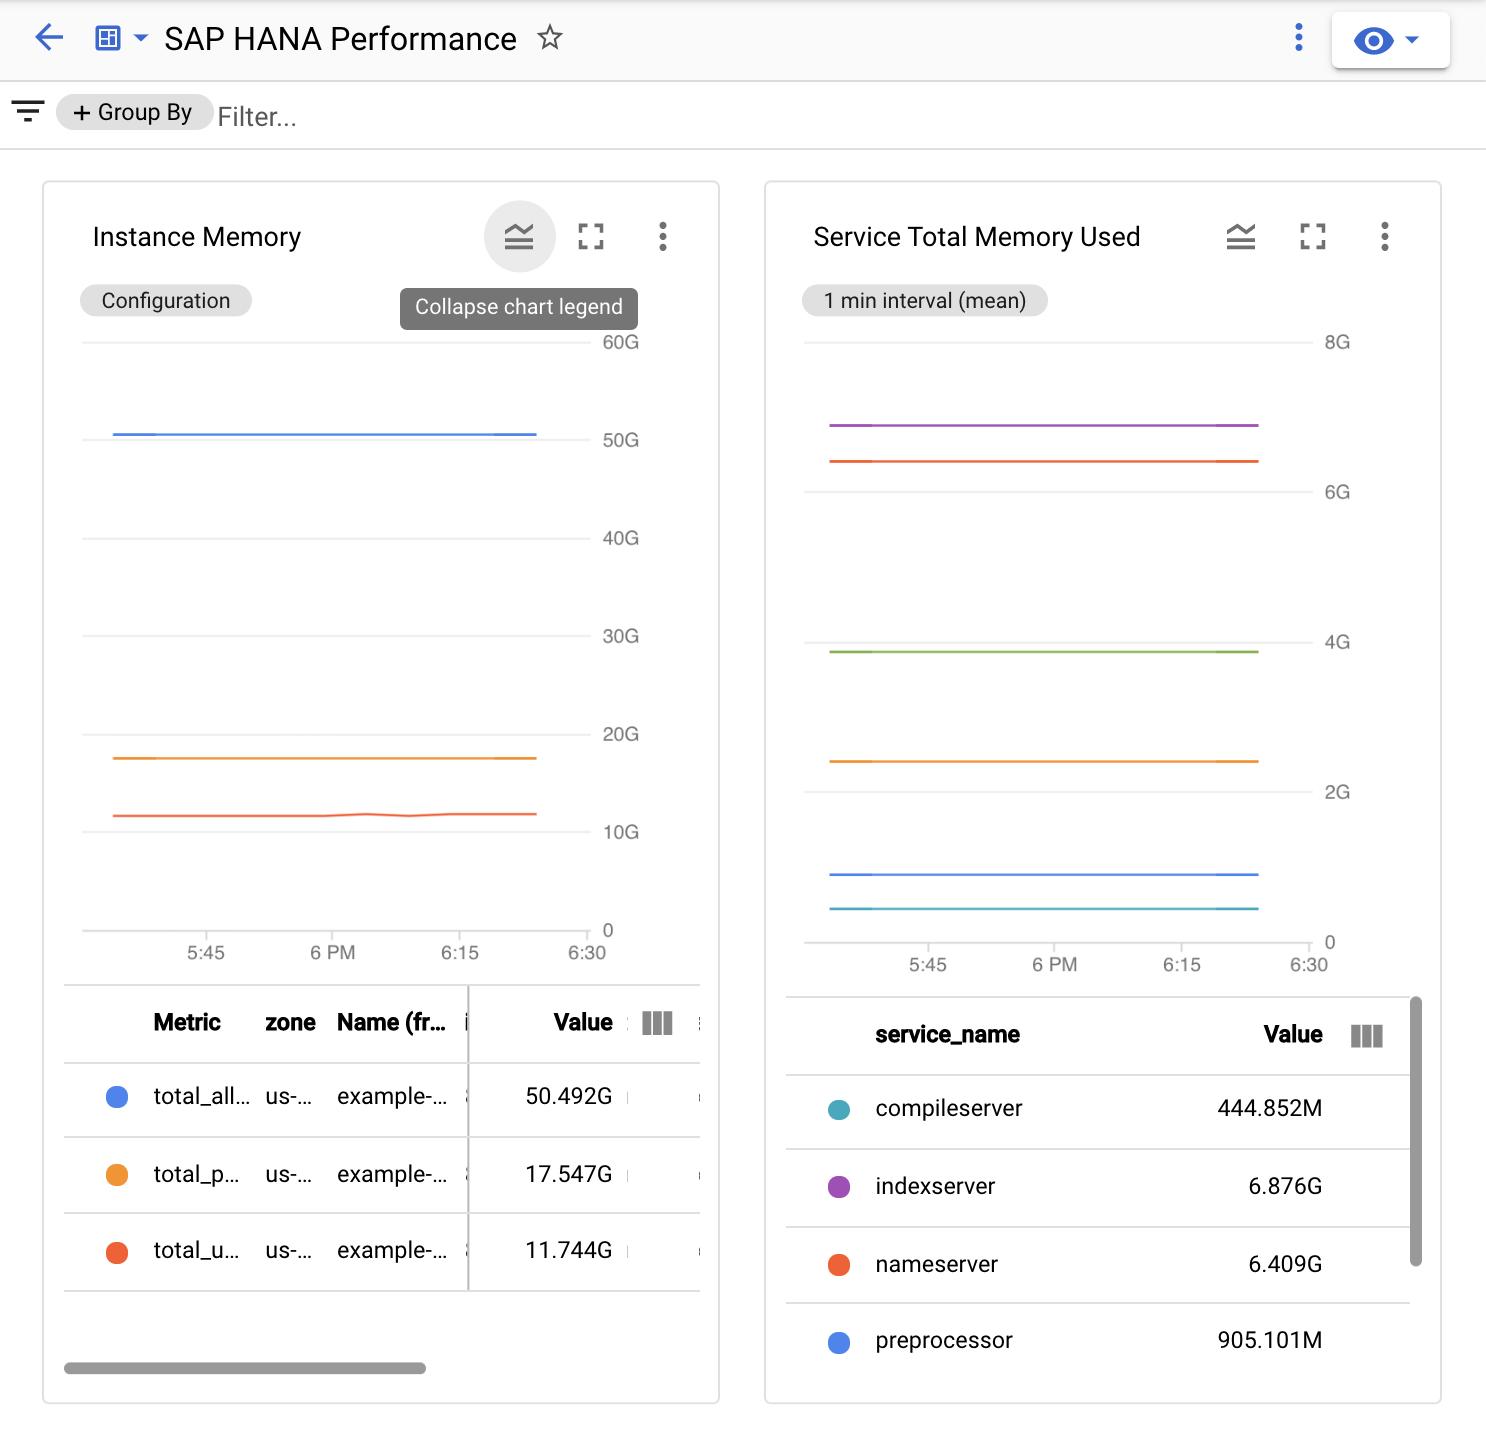 Monitoring에서 커스텀 SAP HANA 성능 대시보드의 상위 2개 차트를 보여주는 화면 캡처